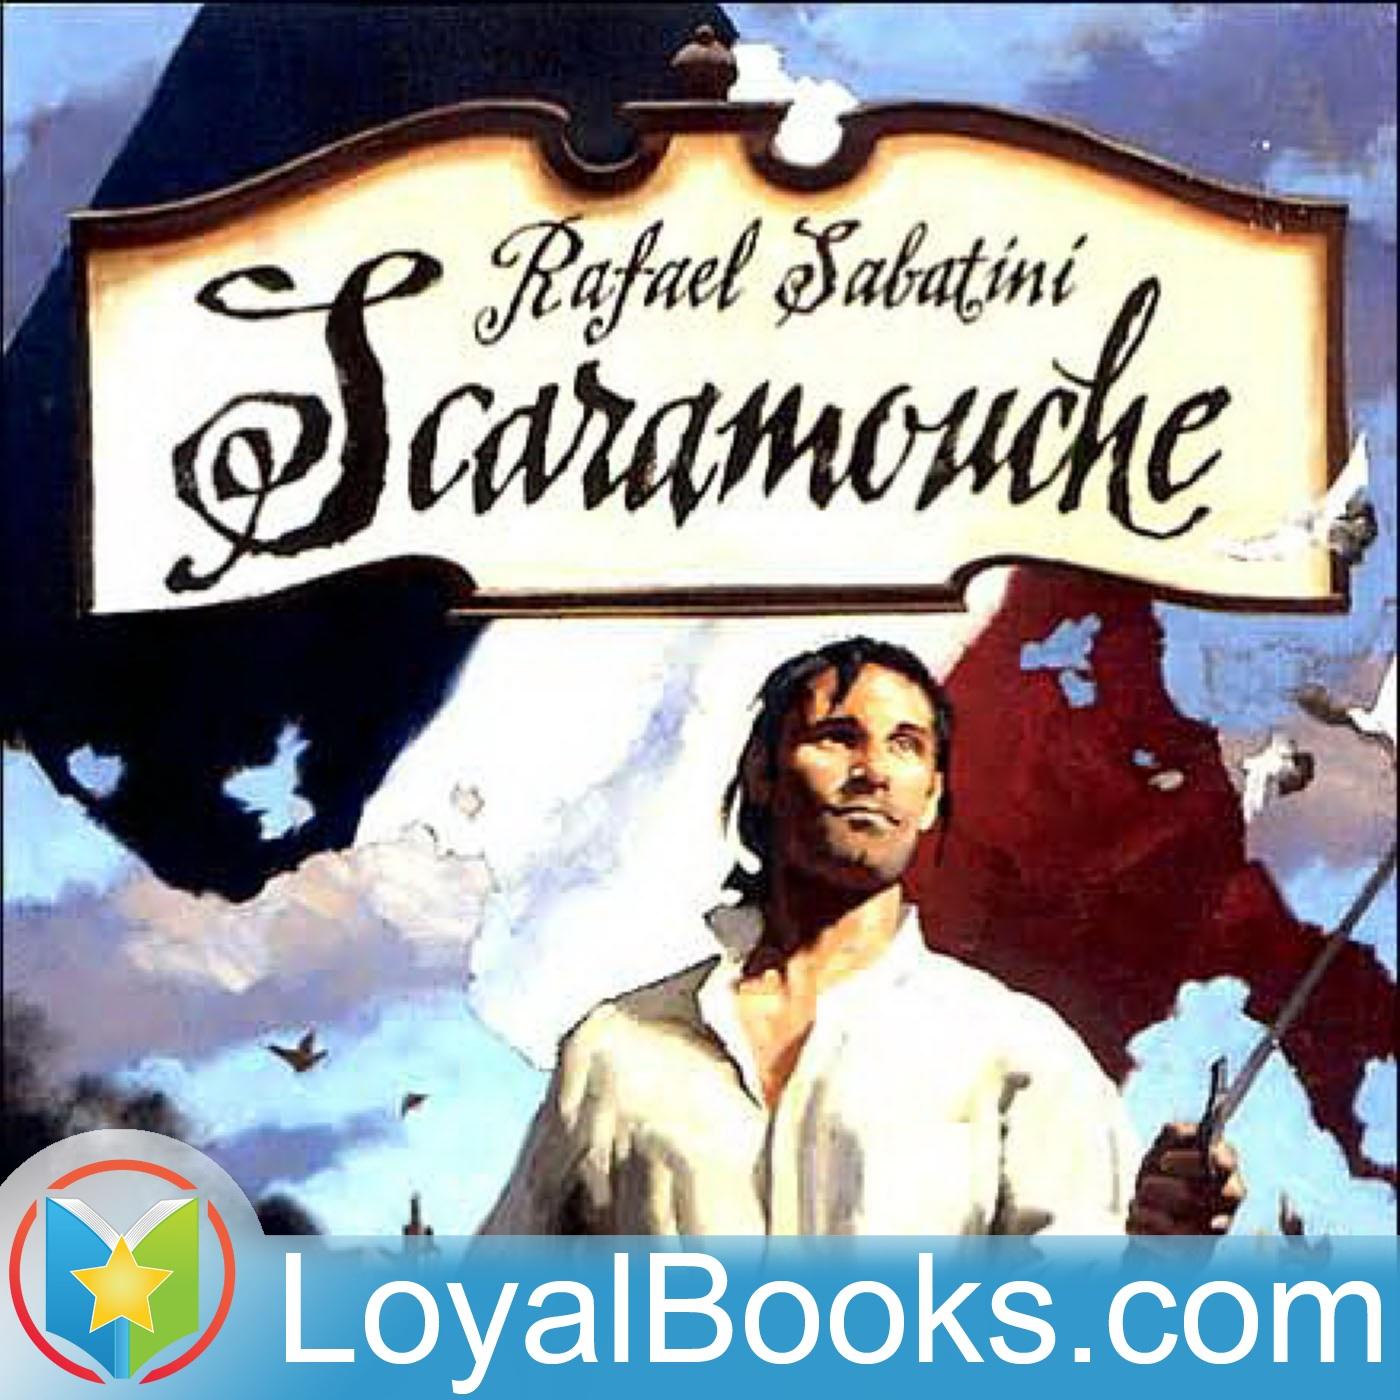 <![CDATA[Scaramouche by Rafael Sabatini]]>